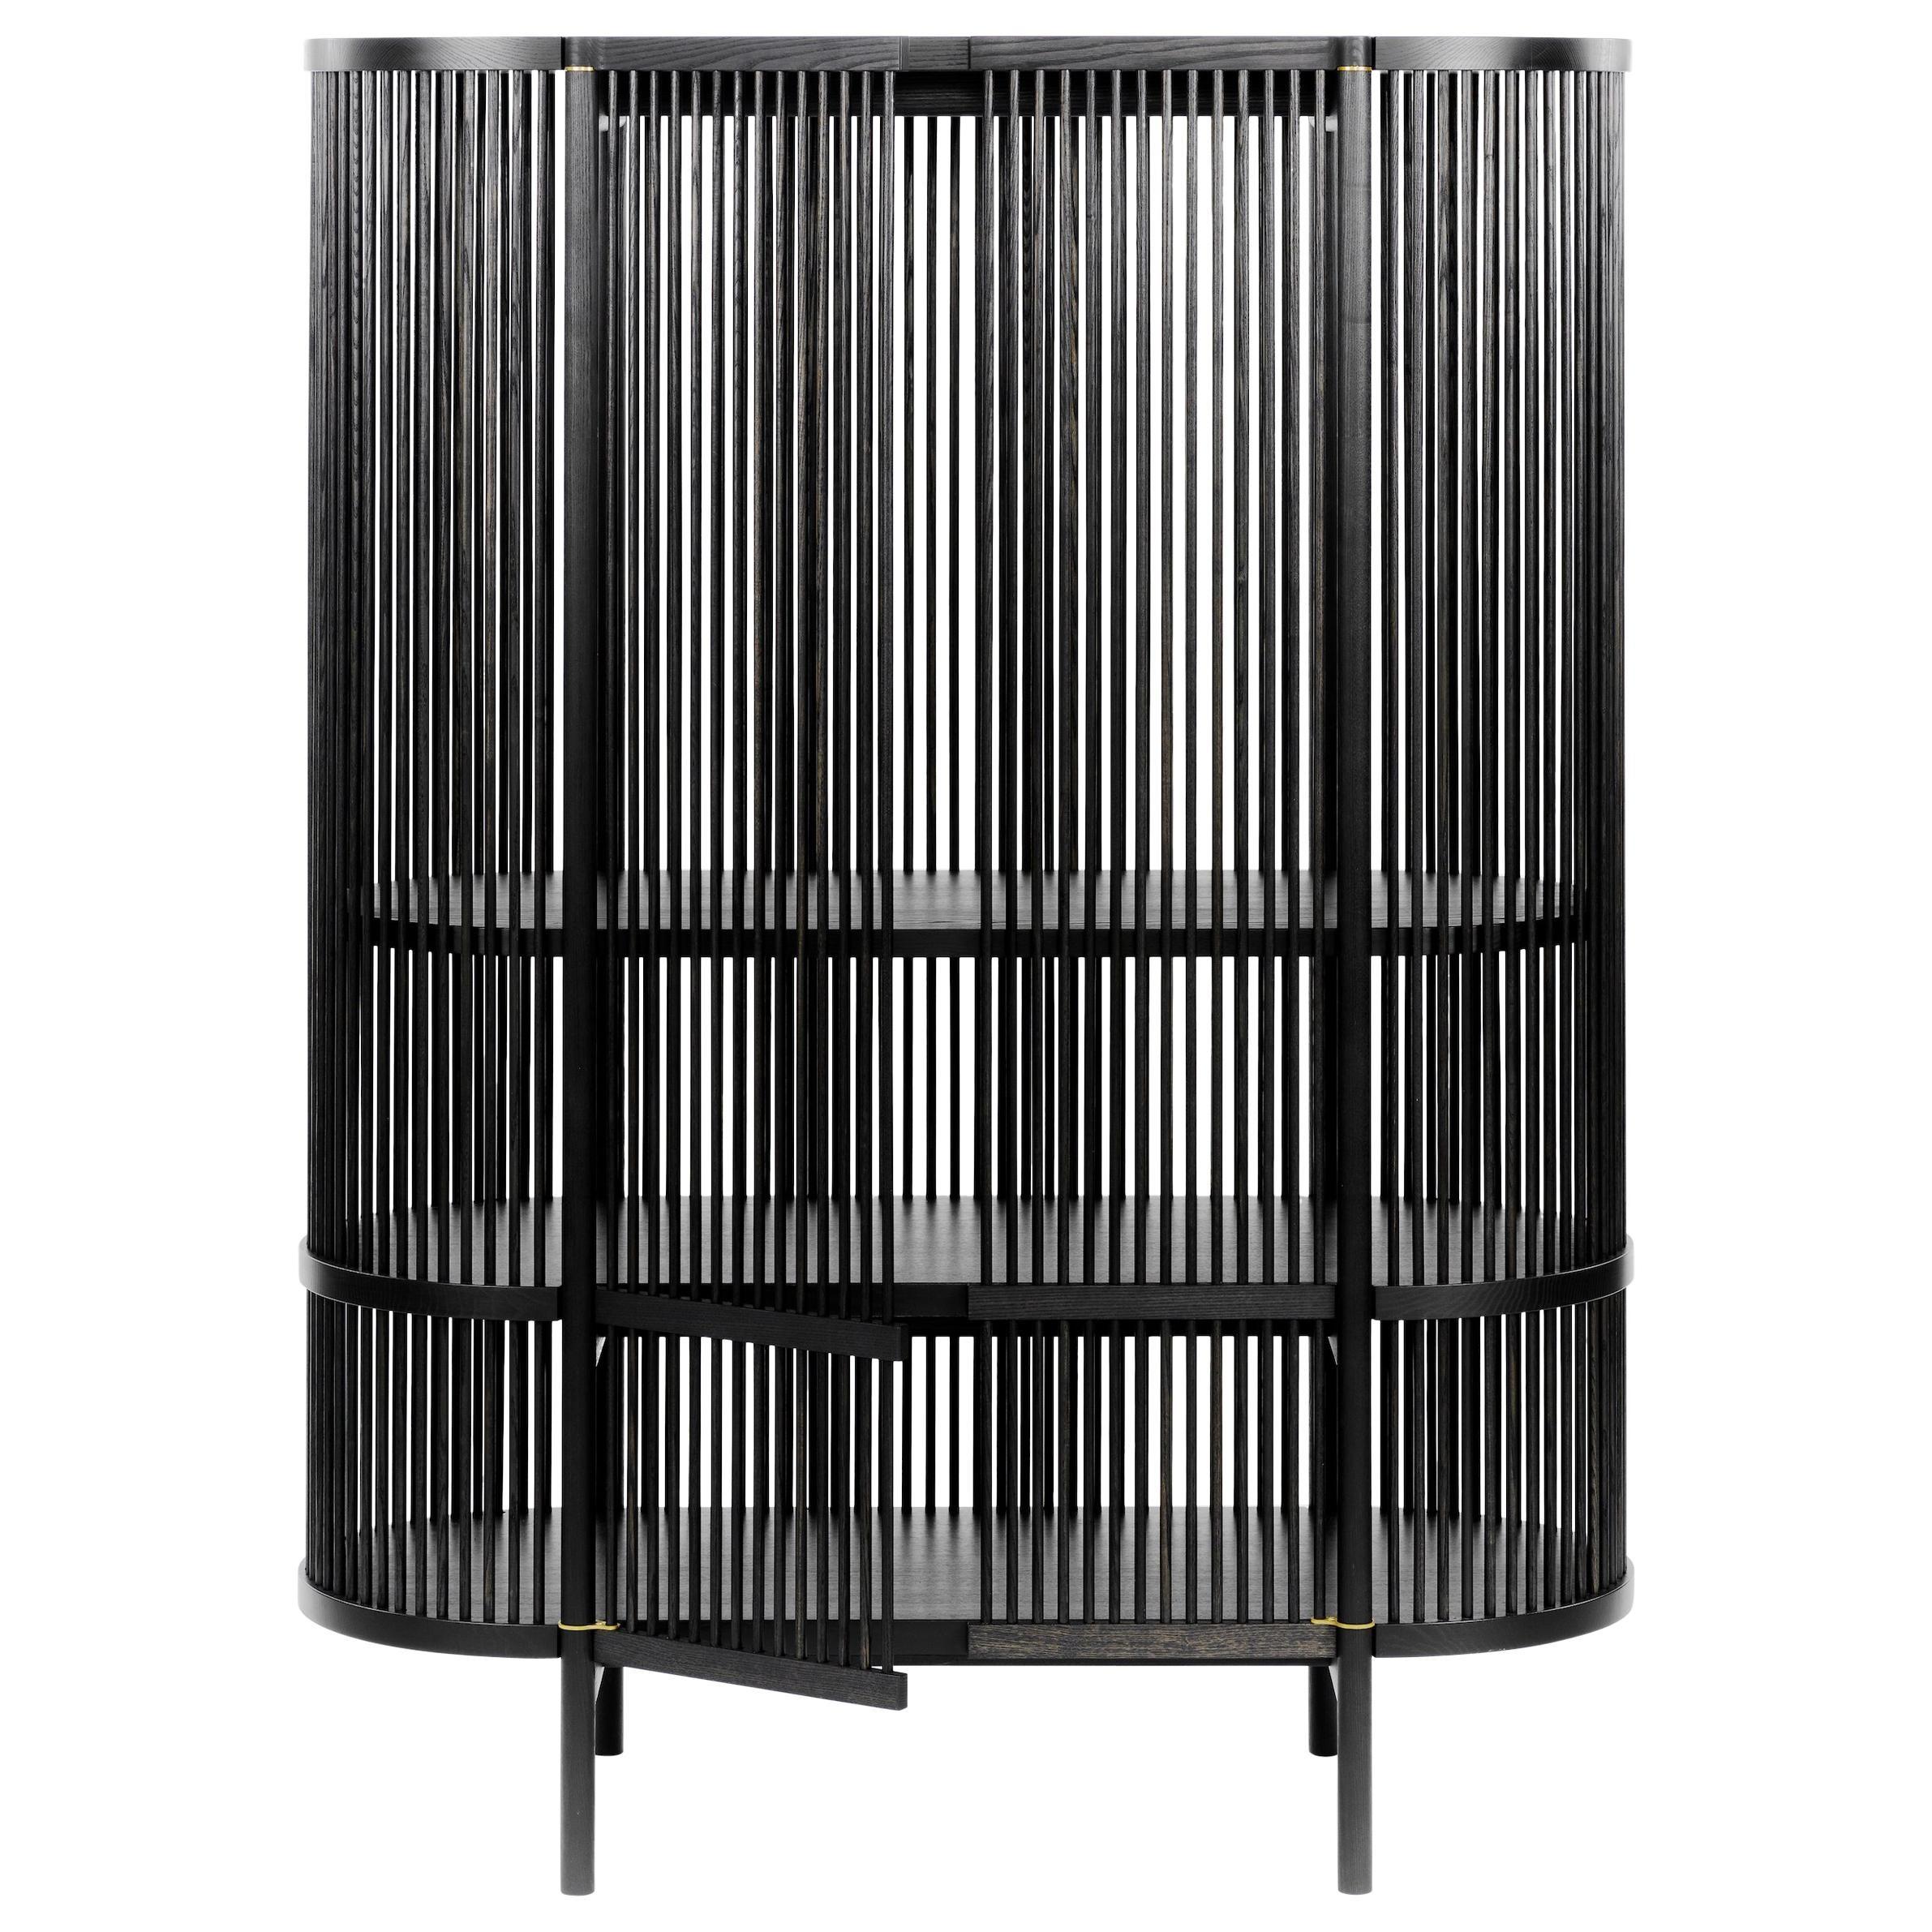 Bastone Cabinet in Black with Doors